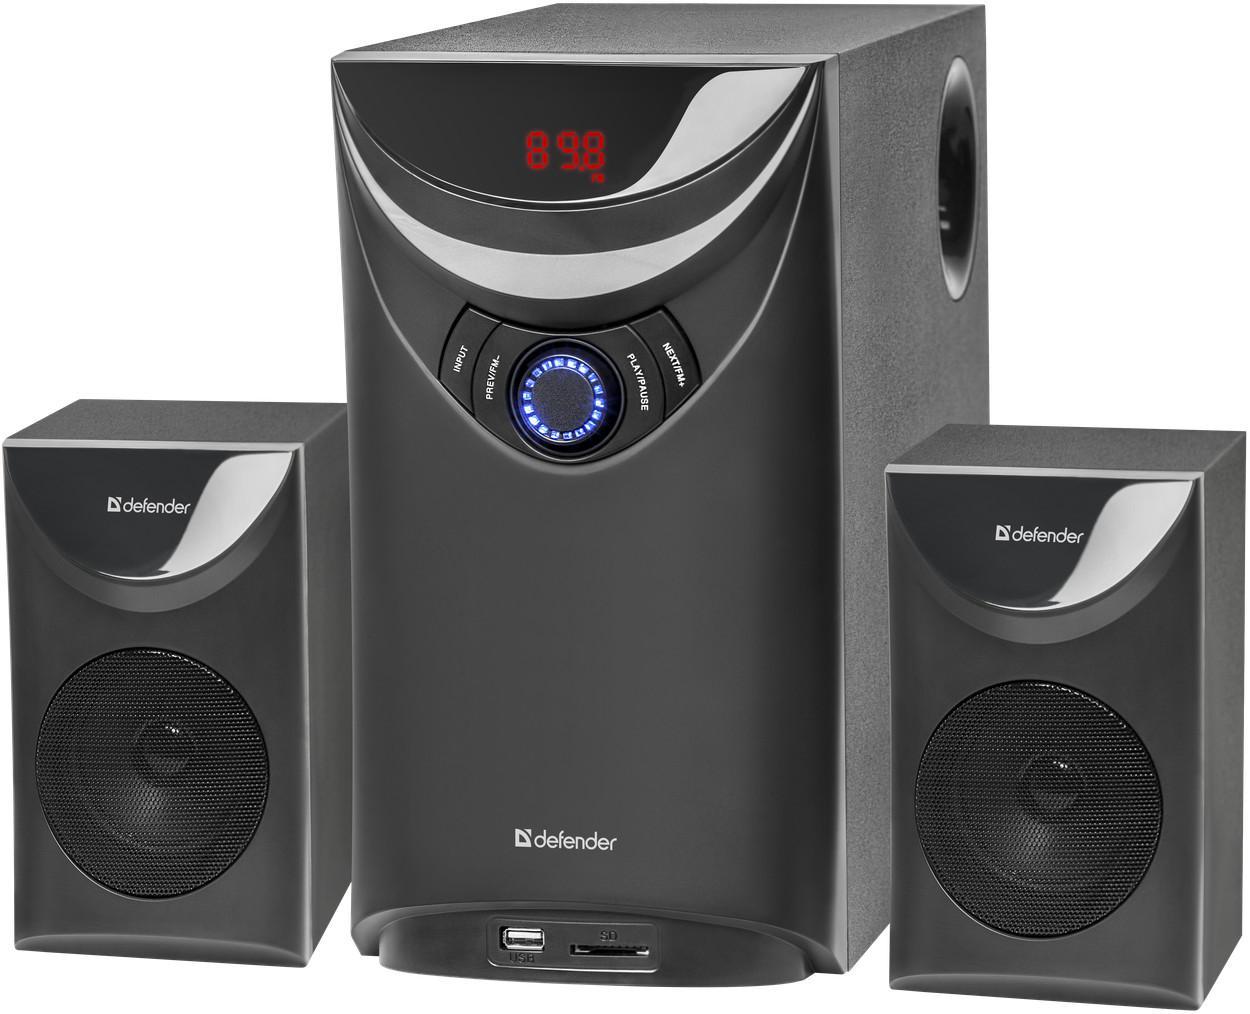 Акустическая система 2.1, Thunder 60 Вт, Bluetooth, FM/MP3/SD/USB, арт. 65594